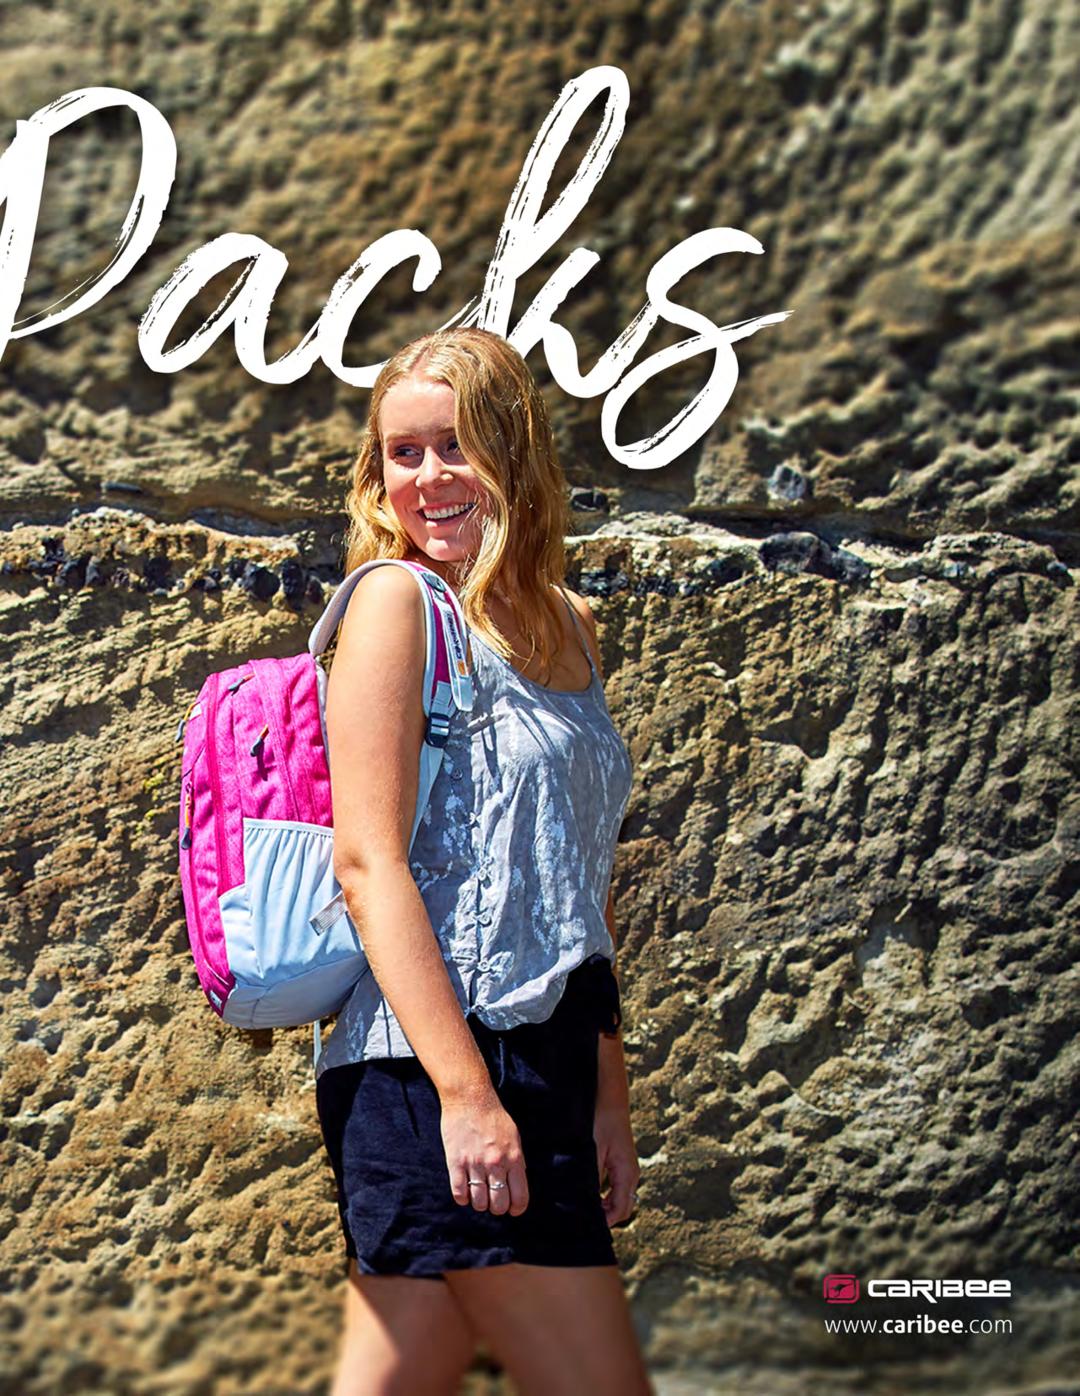 Page 30 of 2021 Caribee Backpacks & Daypacks